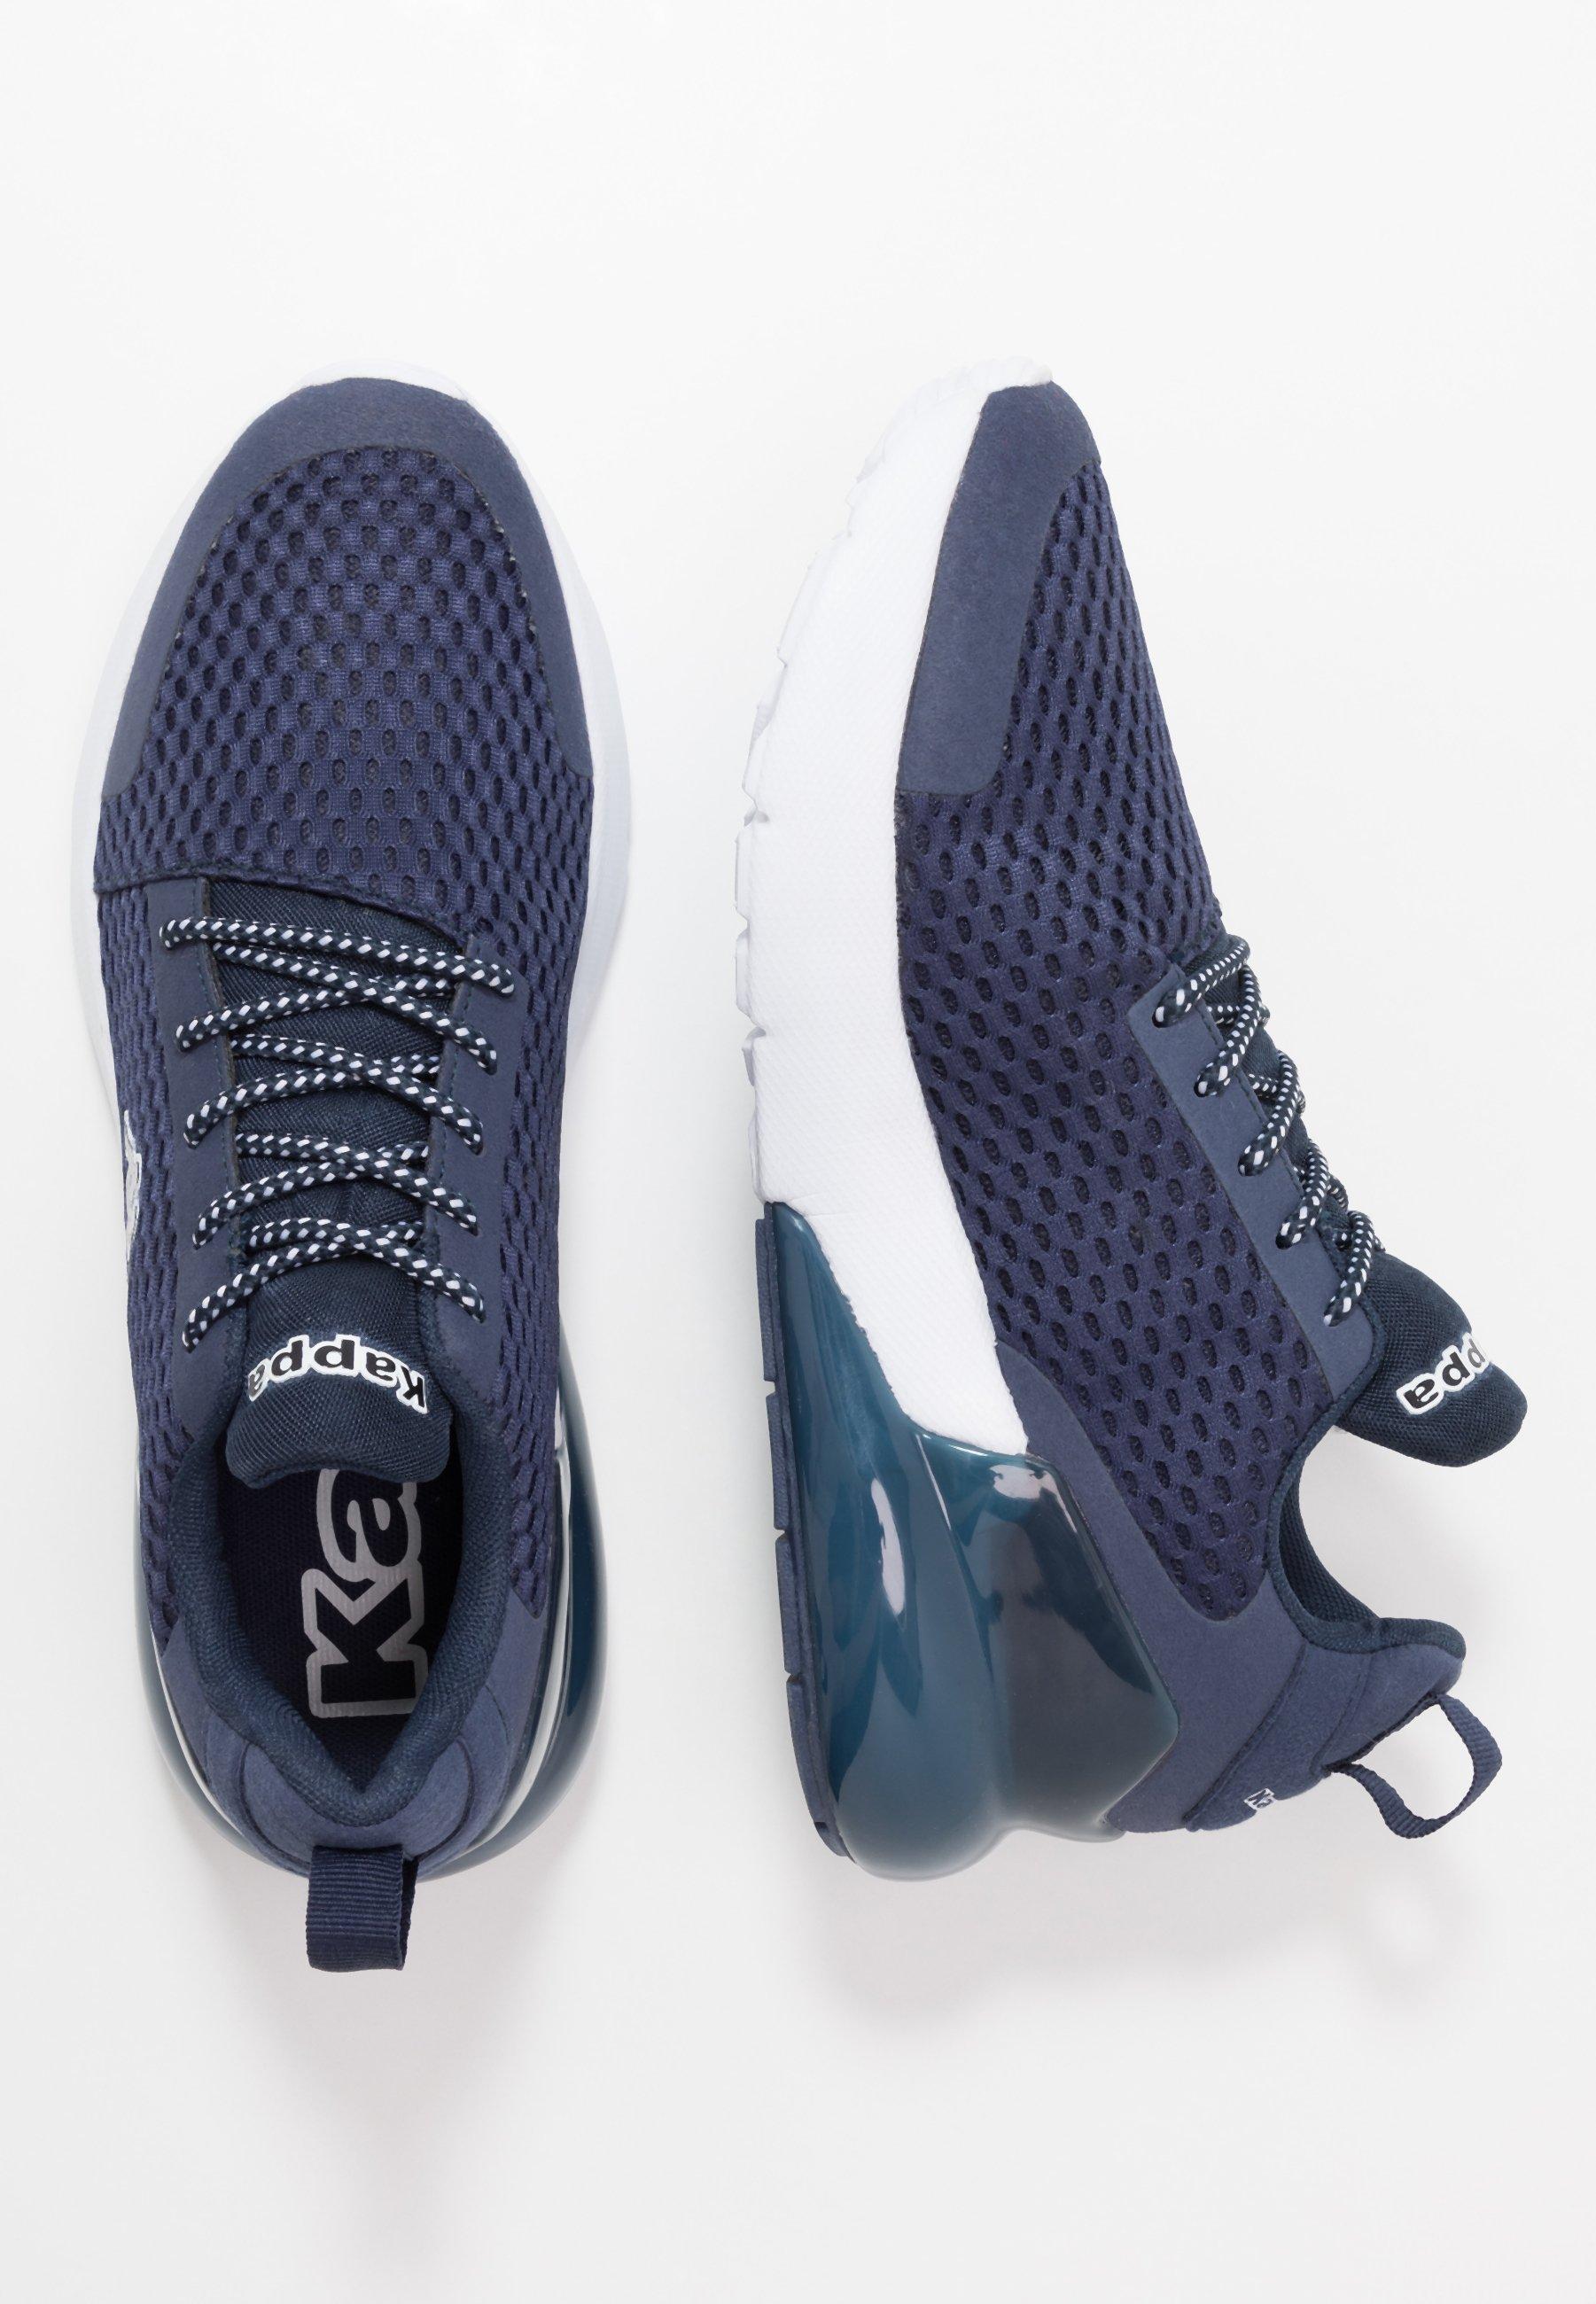 Kappa Colp - Chaussures De Running Neutres Navy/white